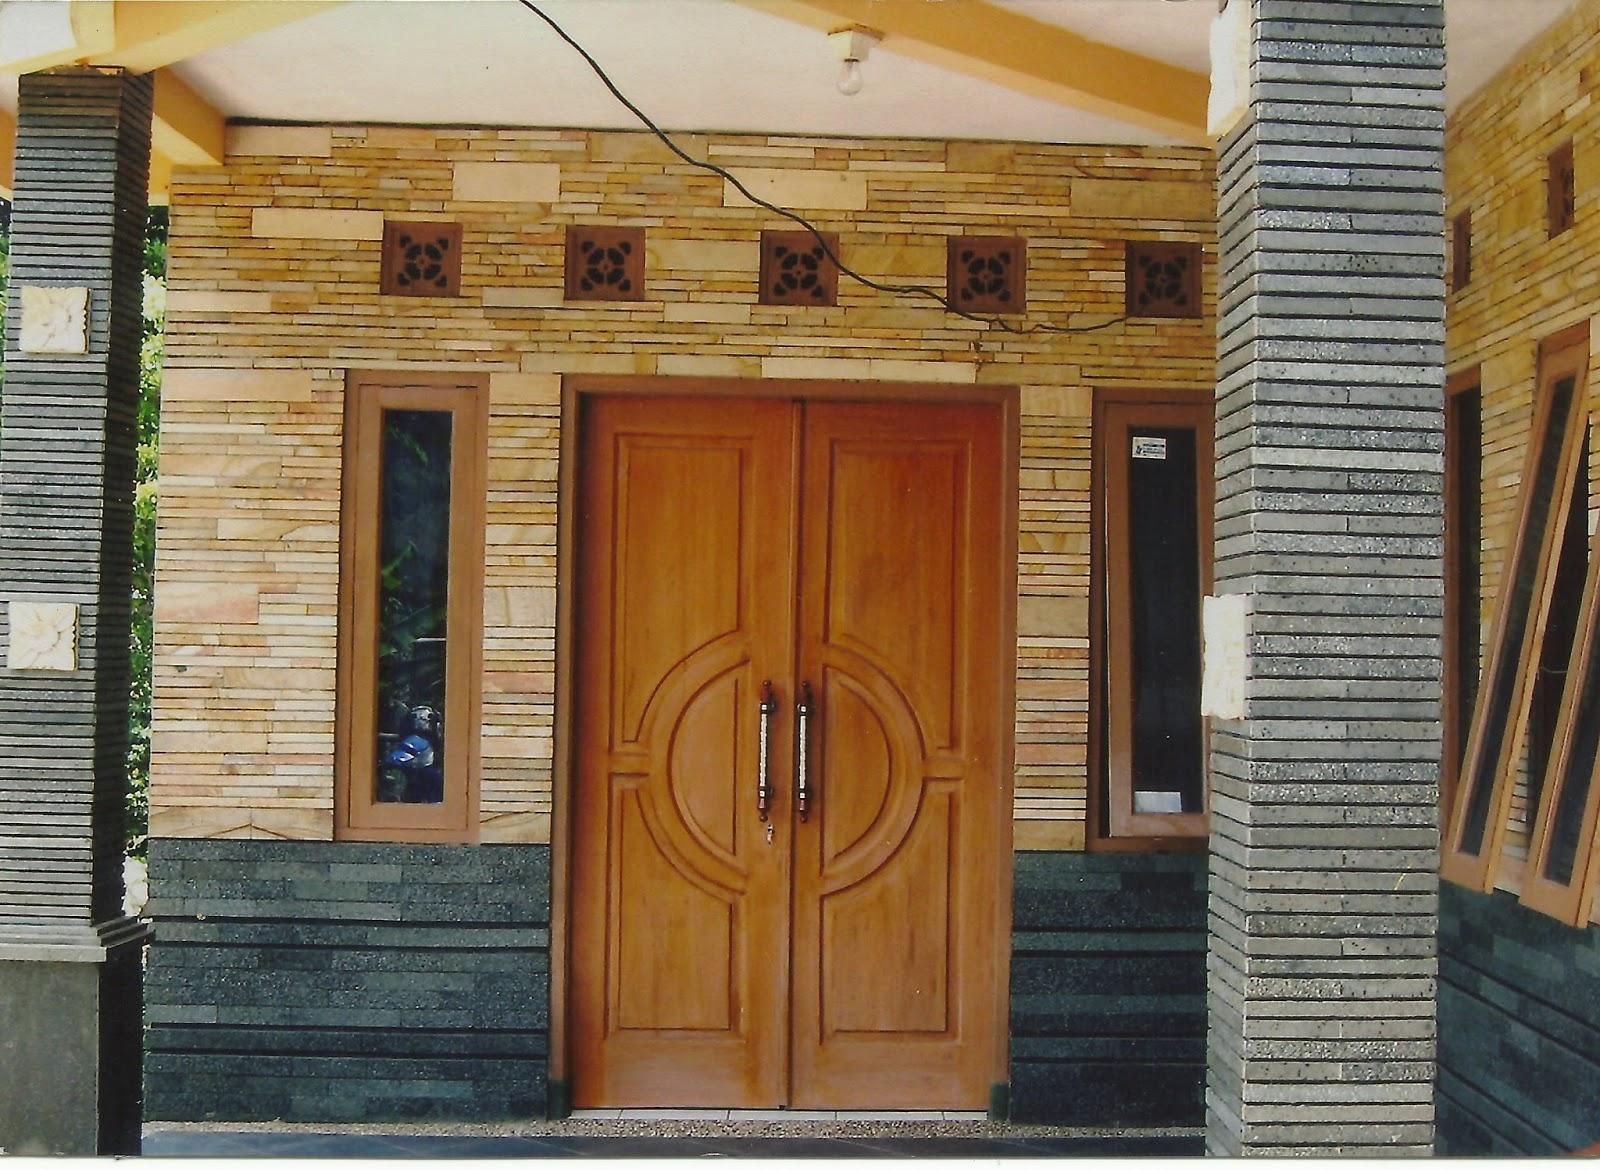 Gambar Keramik Dinding Kamar Tidur Motif Kayu Terbaru ...